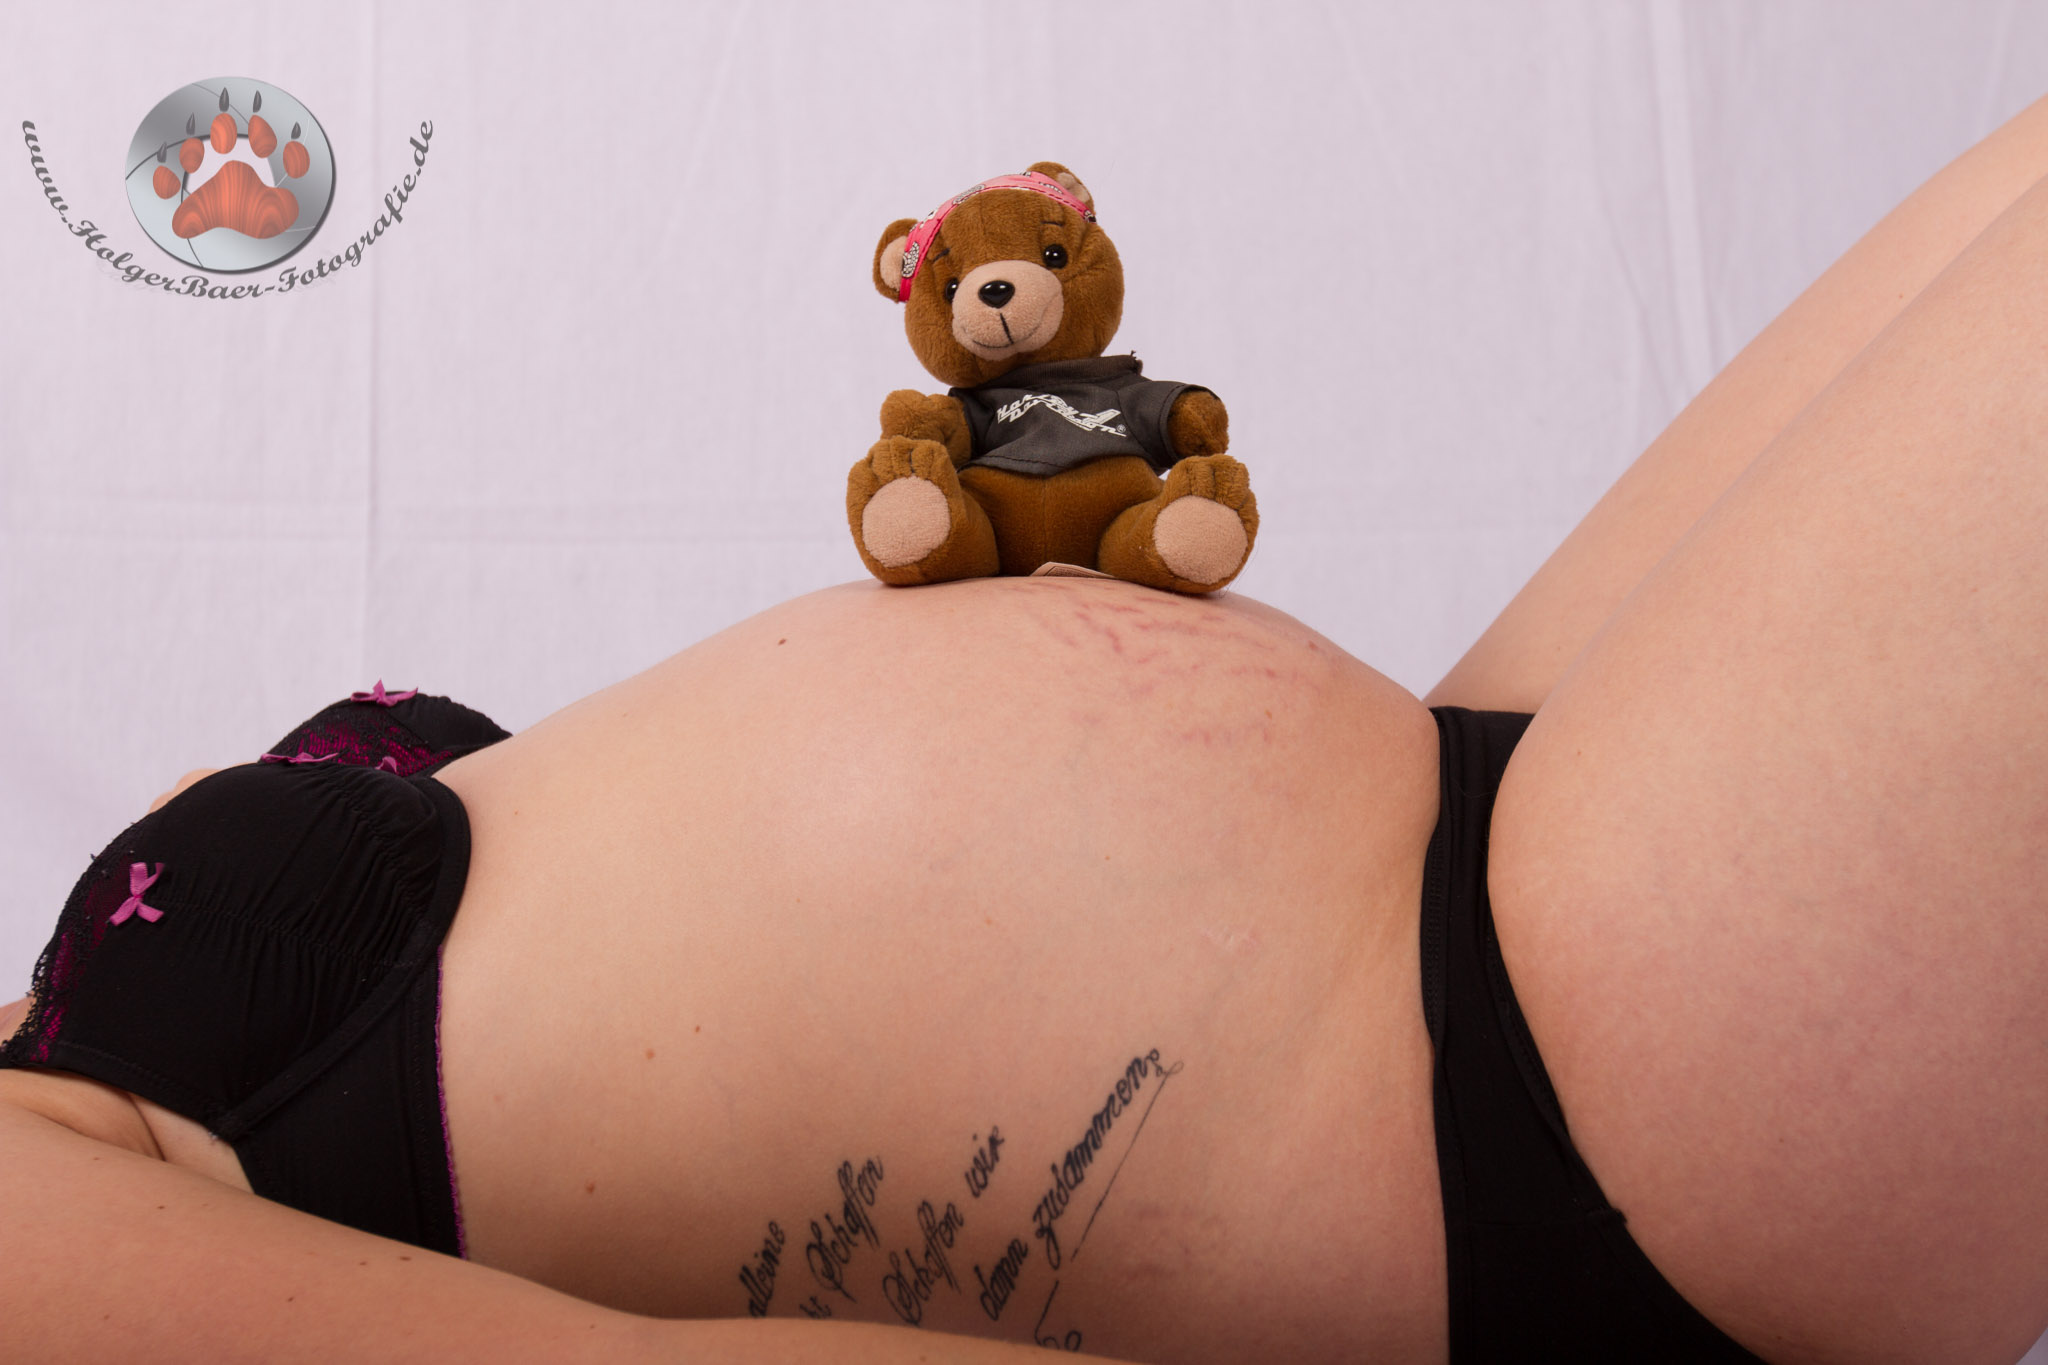 Schwangerschaft / Baby / Kinder